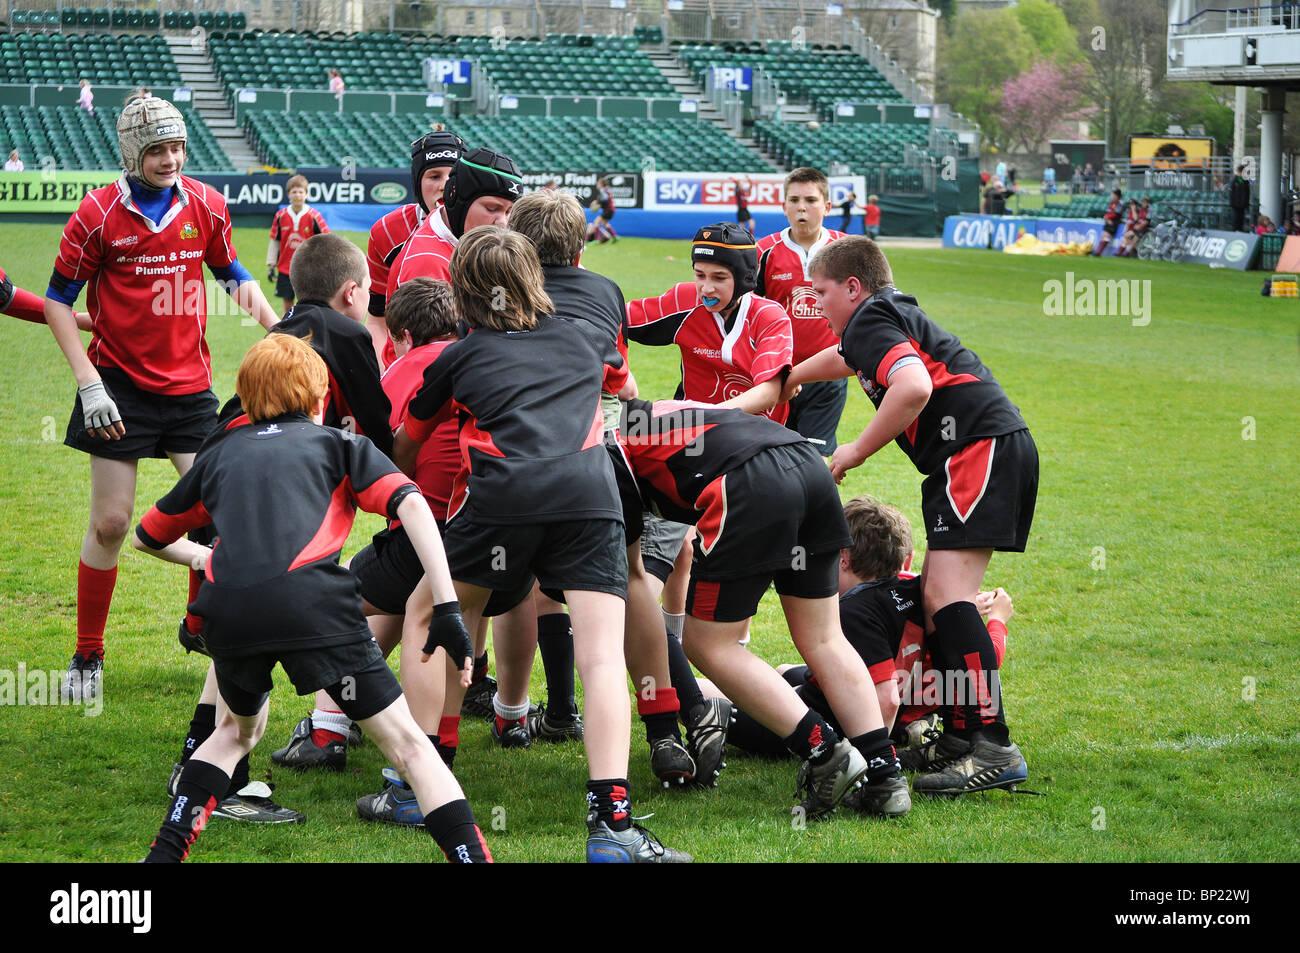 young boys playing rugby, bath, england, uk - Stock Image